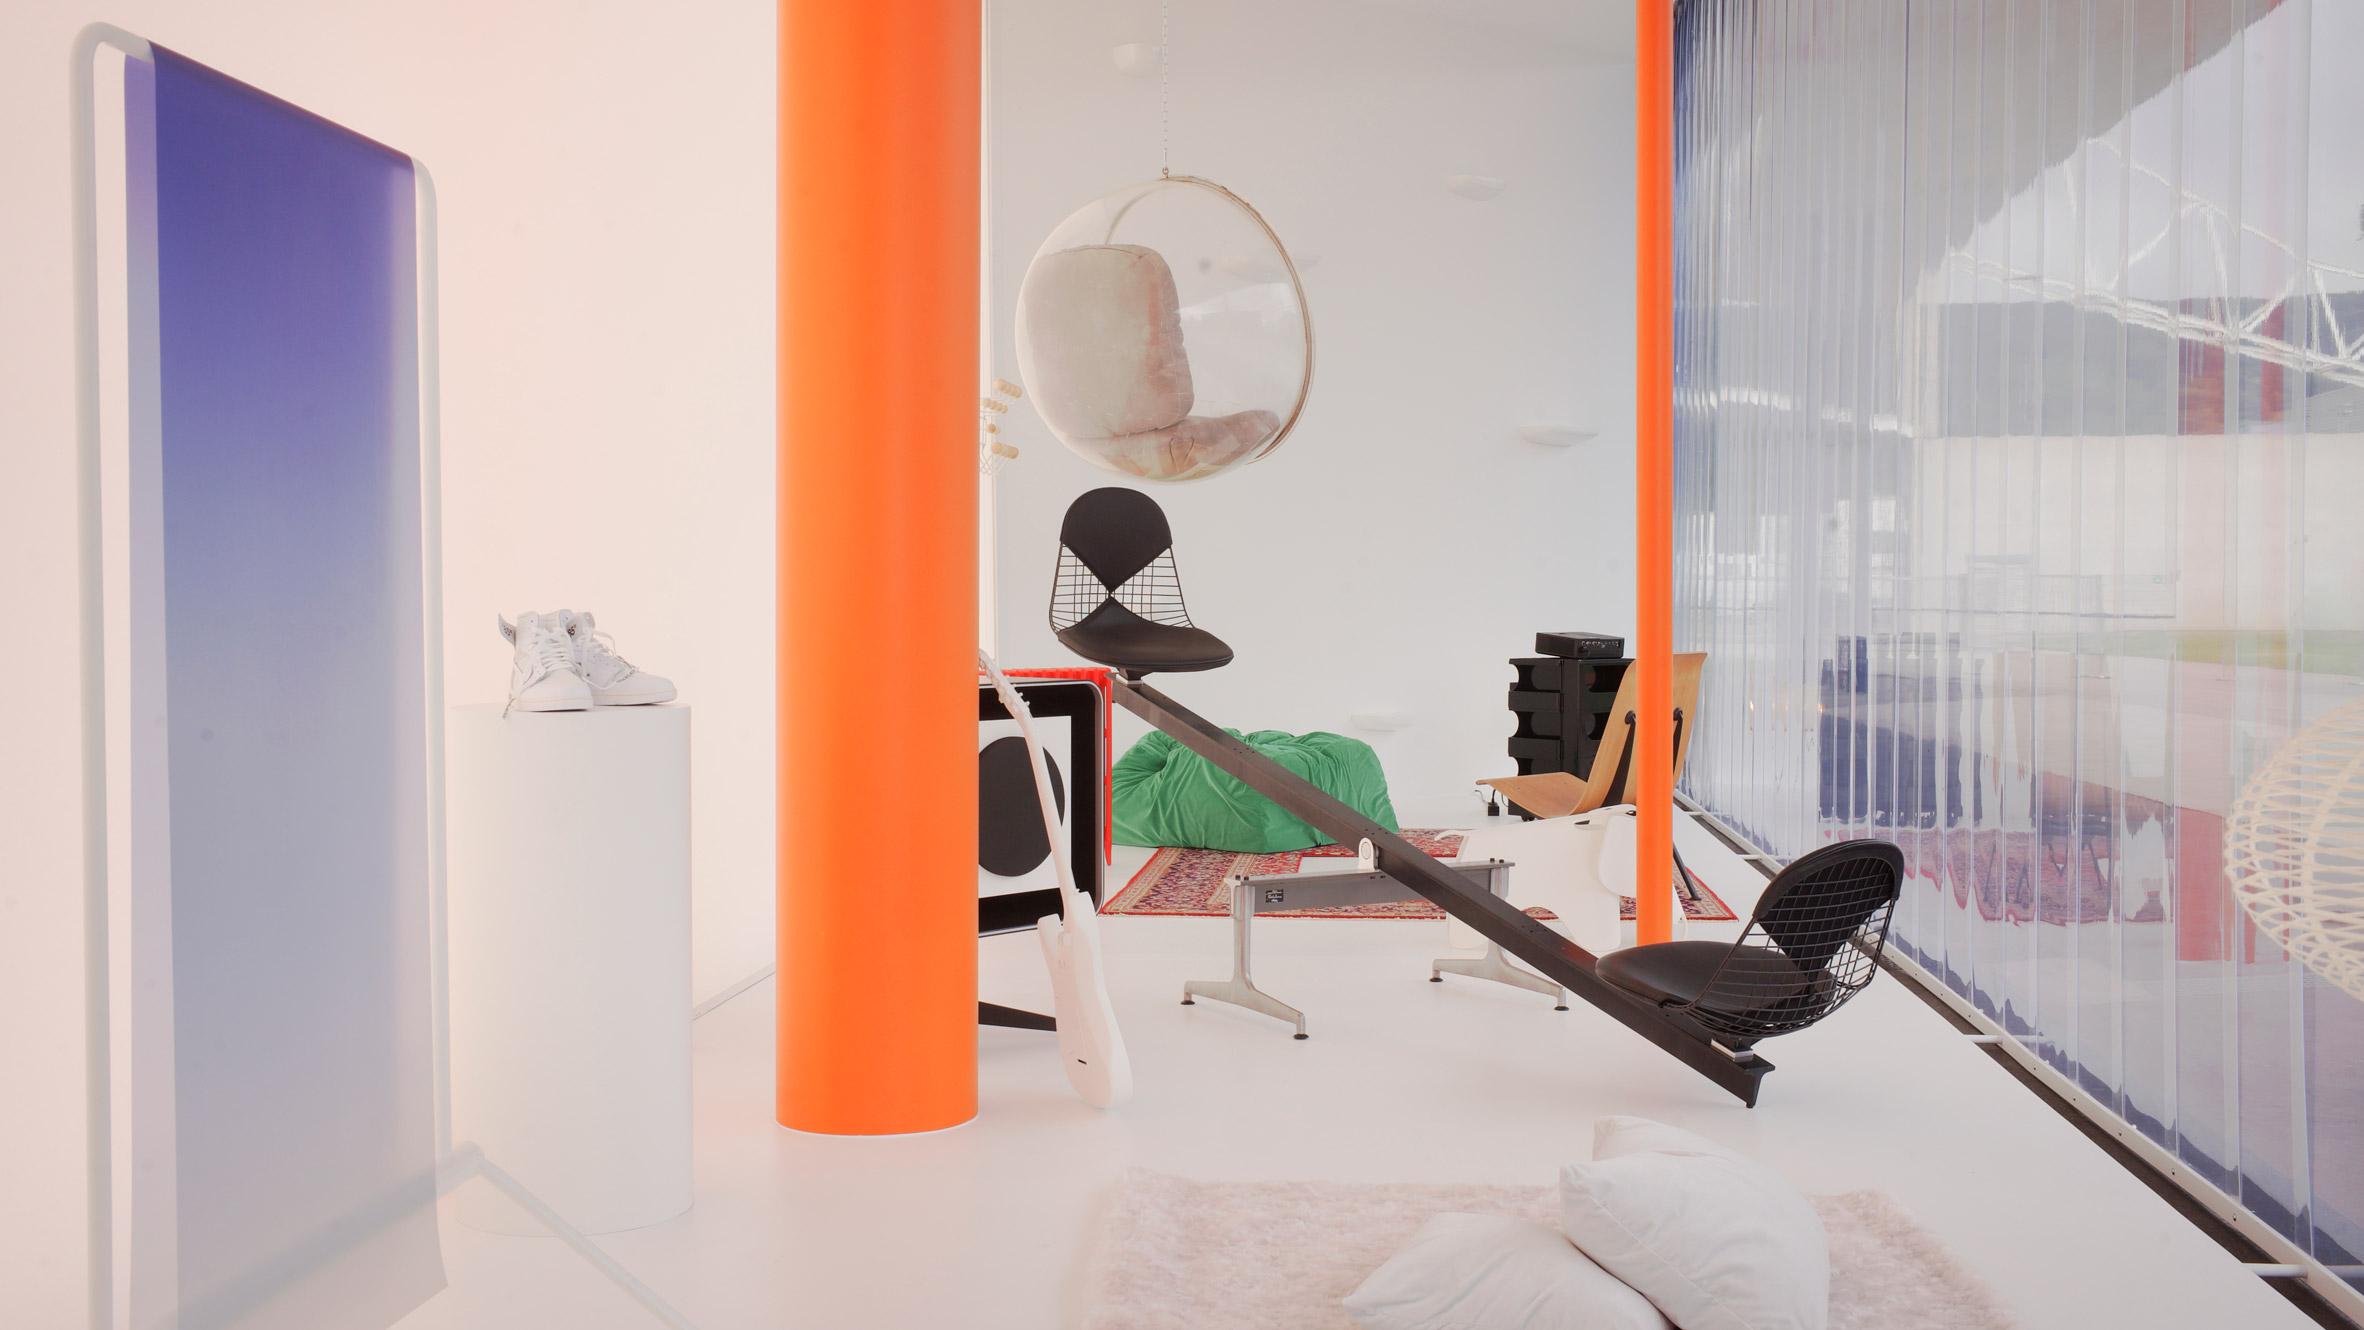 vitra-virgil-abloh-furniture-lighting_dezeen_2364_hero.jpg